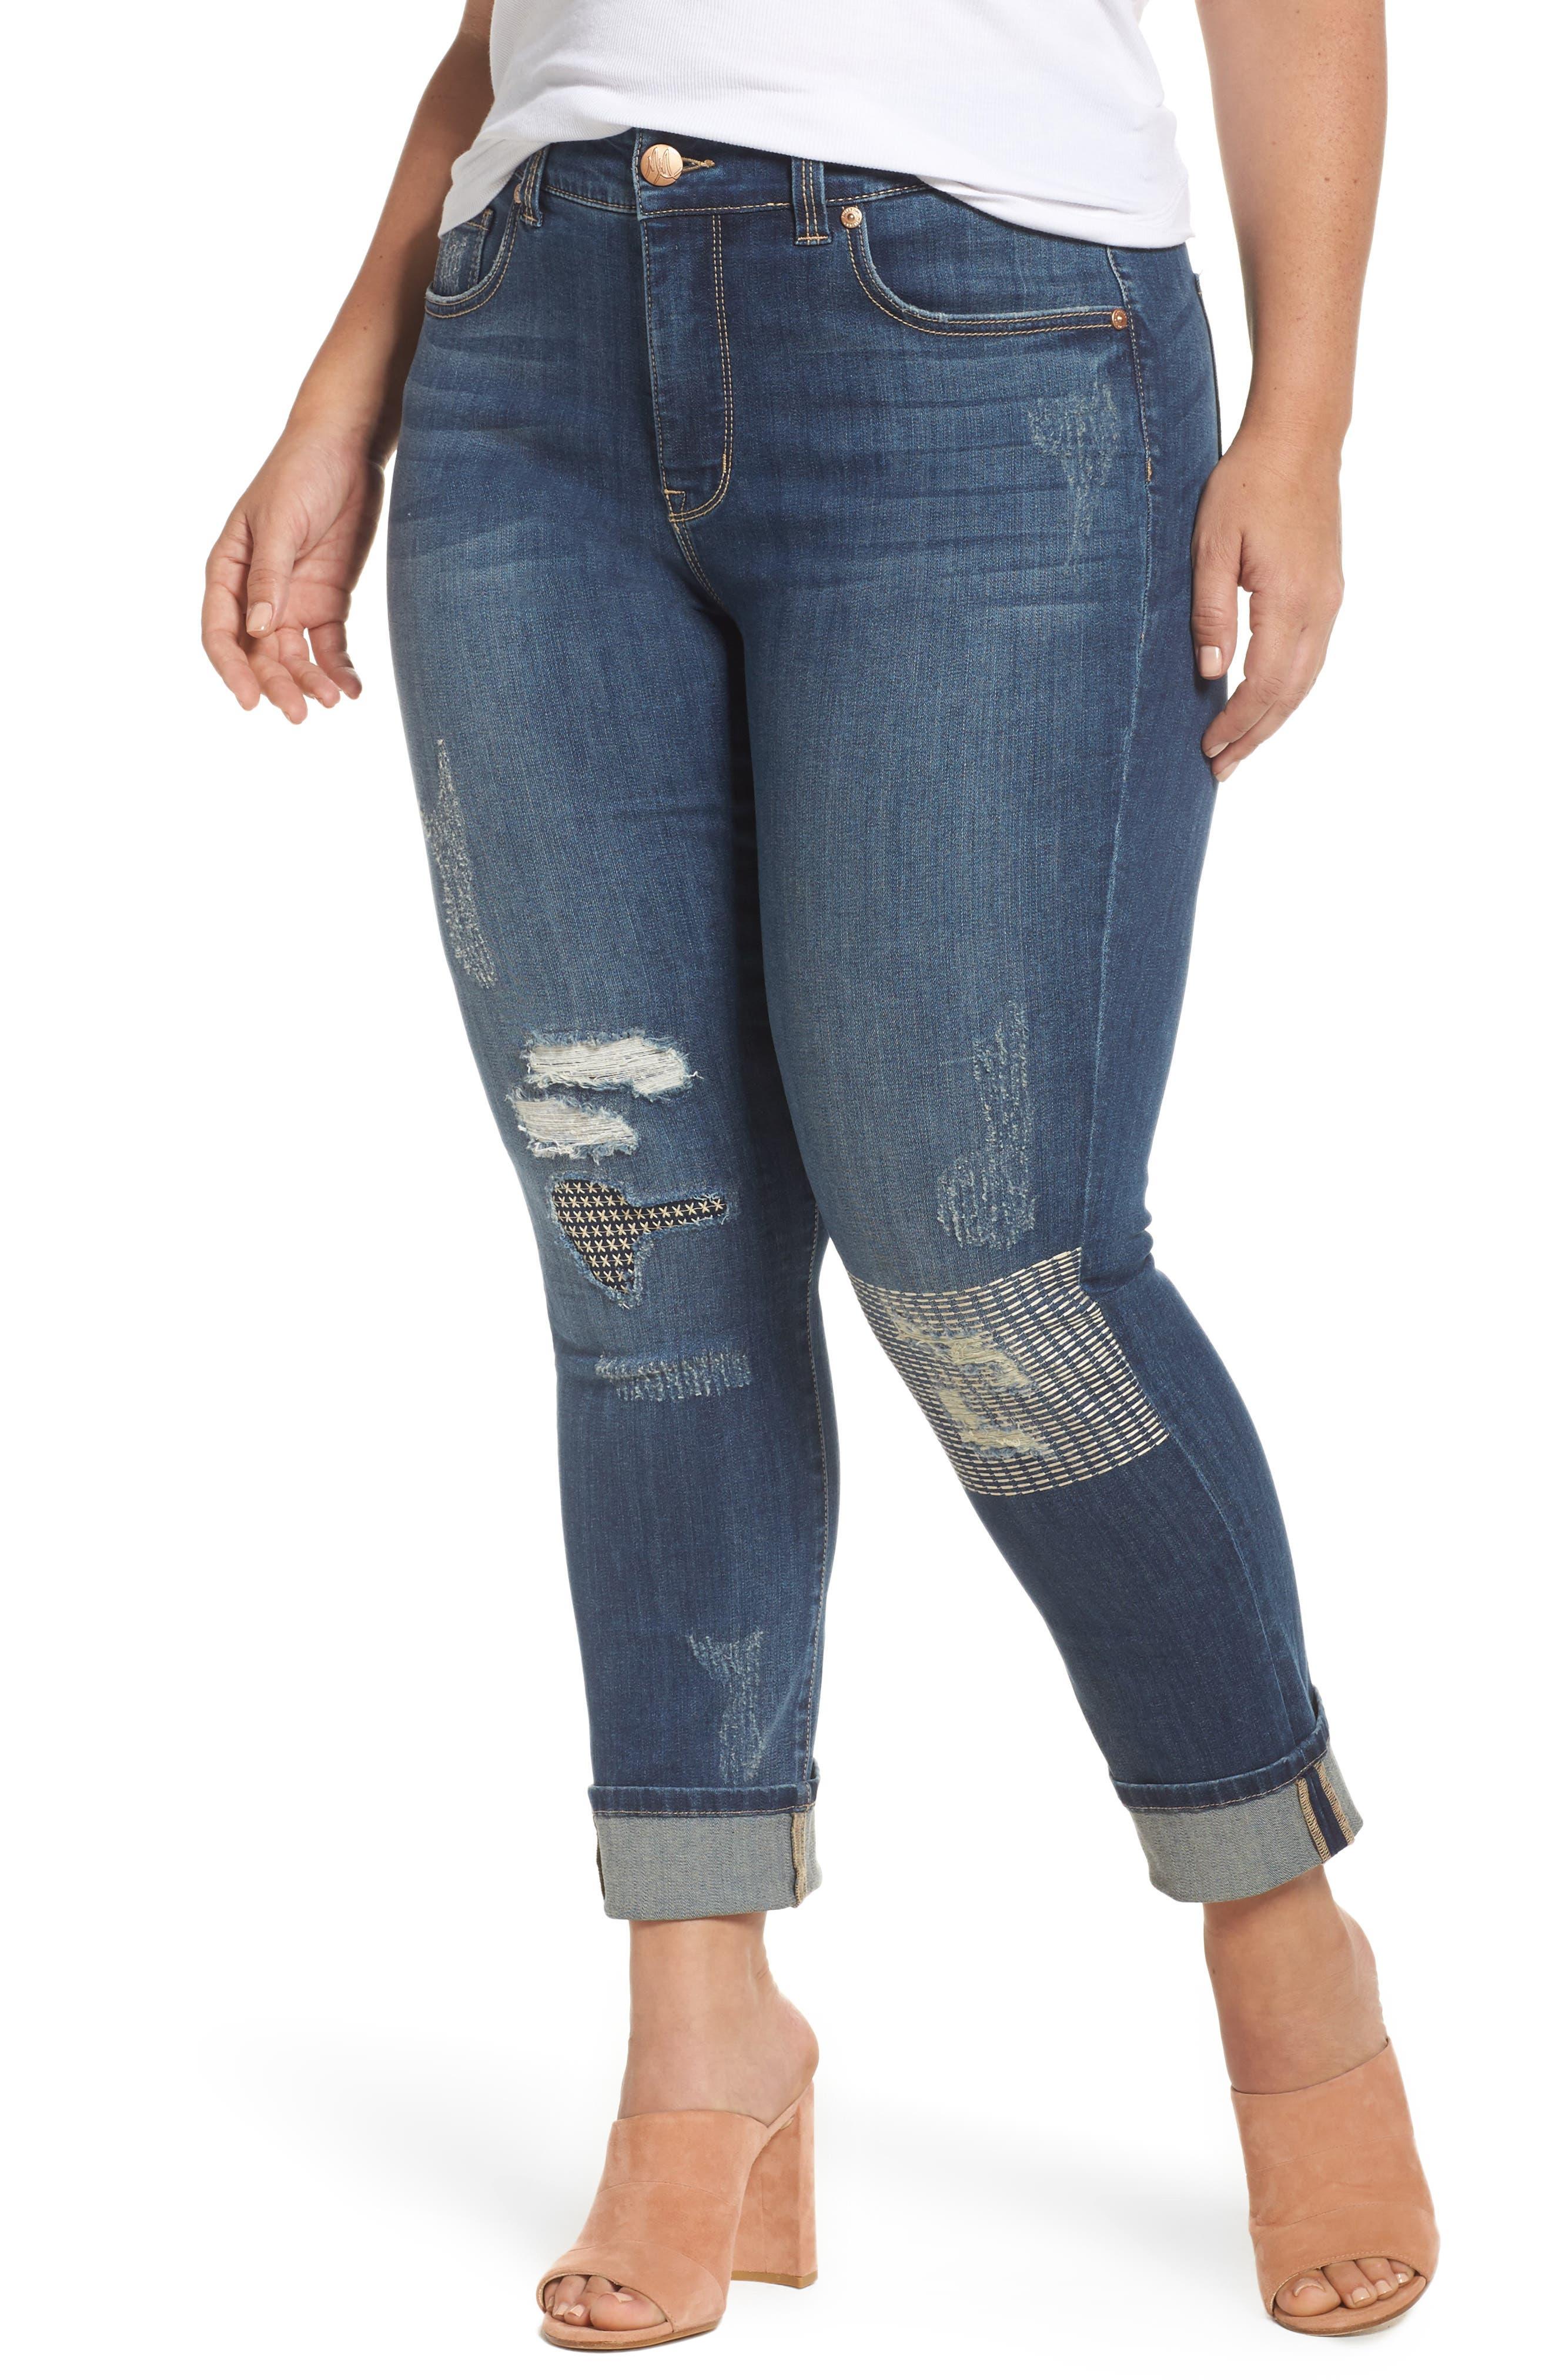 Melissa McCarthy Seven7 Stitch & Repair Roll Cuff Skinny Jeans (Nepal) (Plus Size)